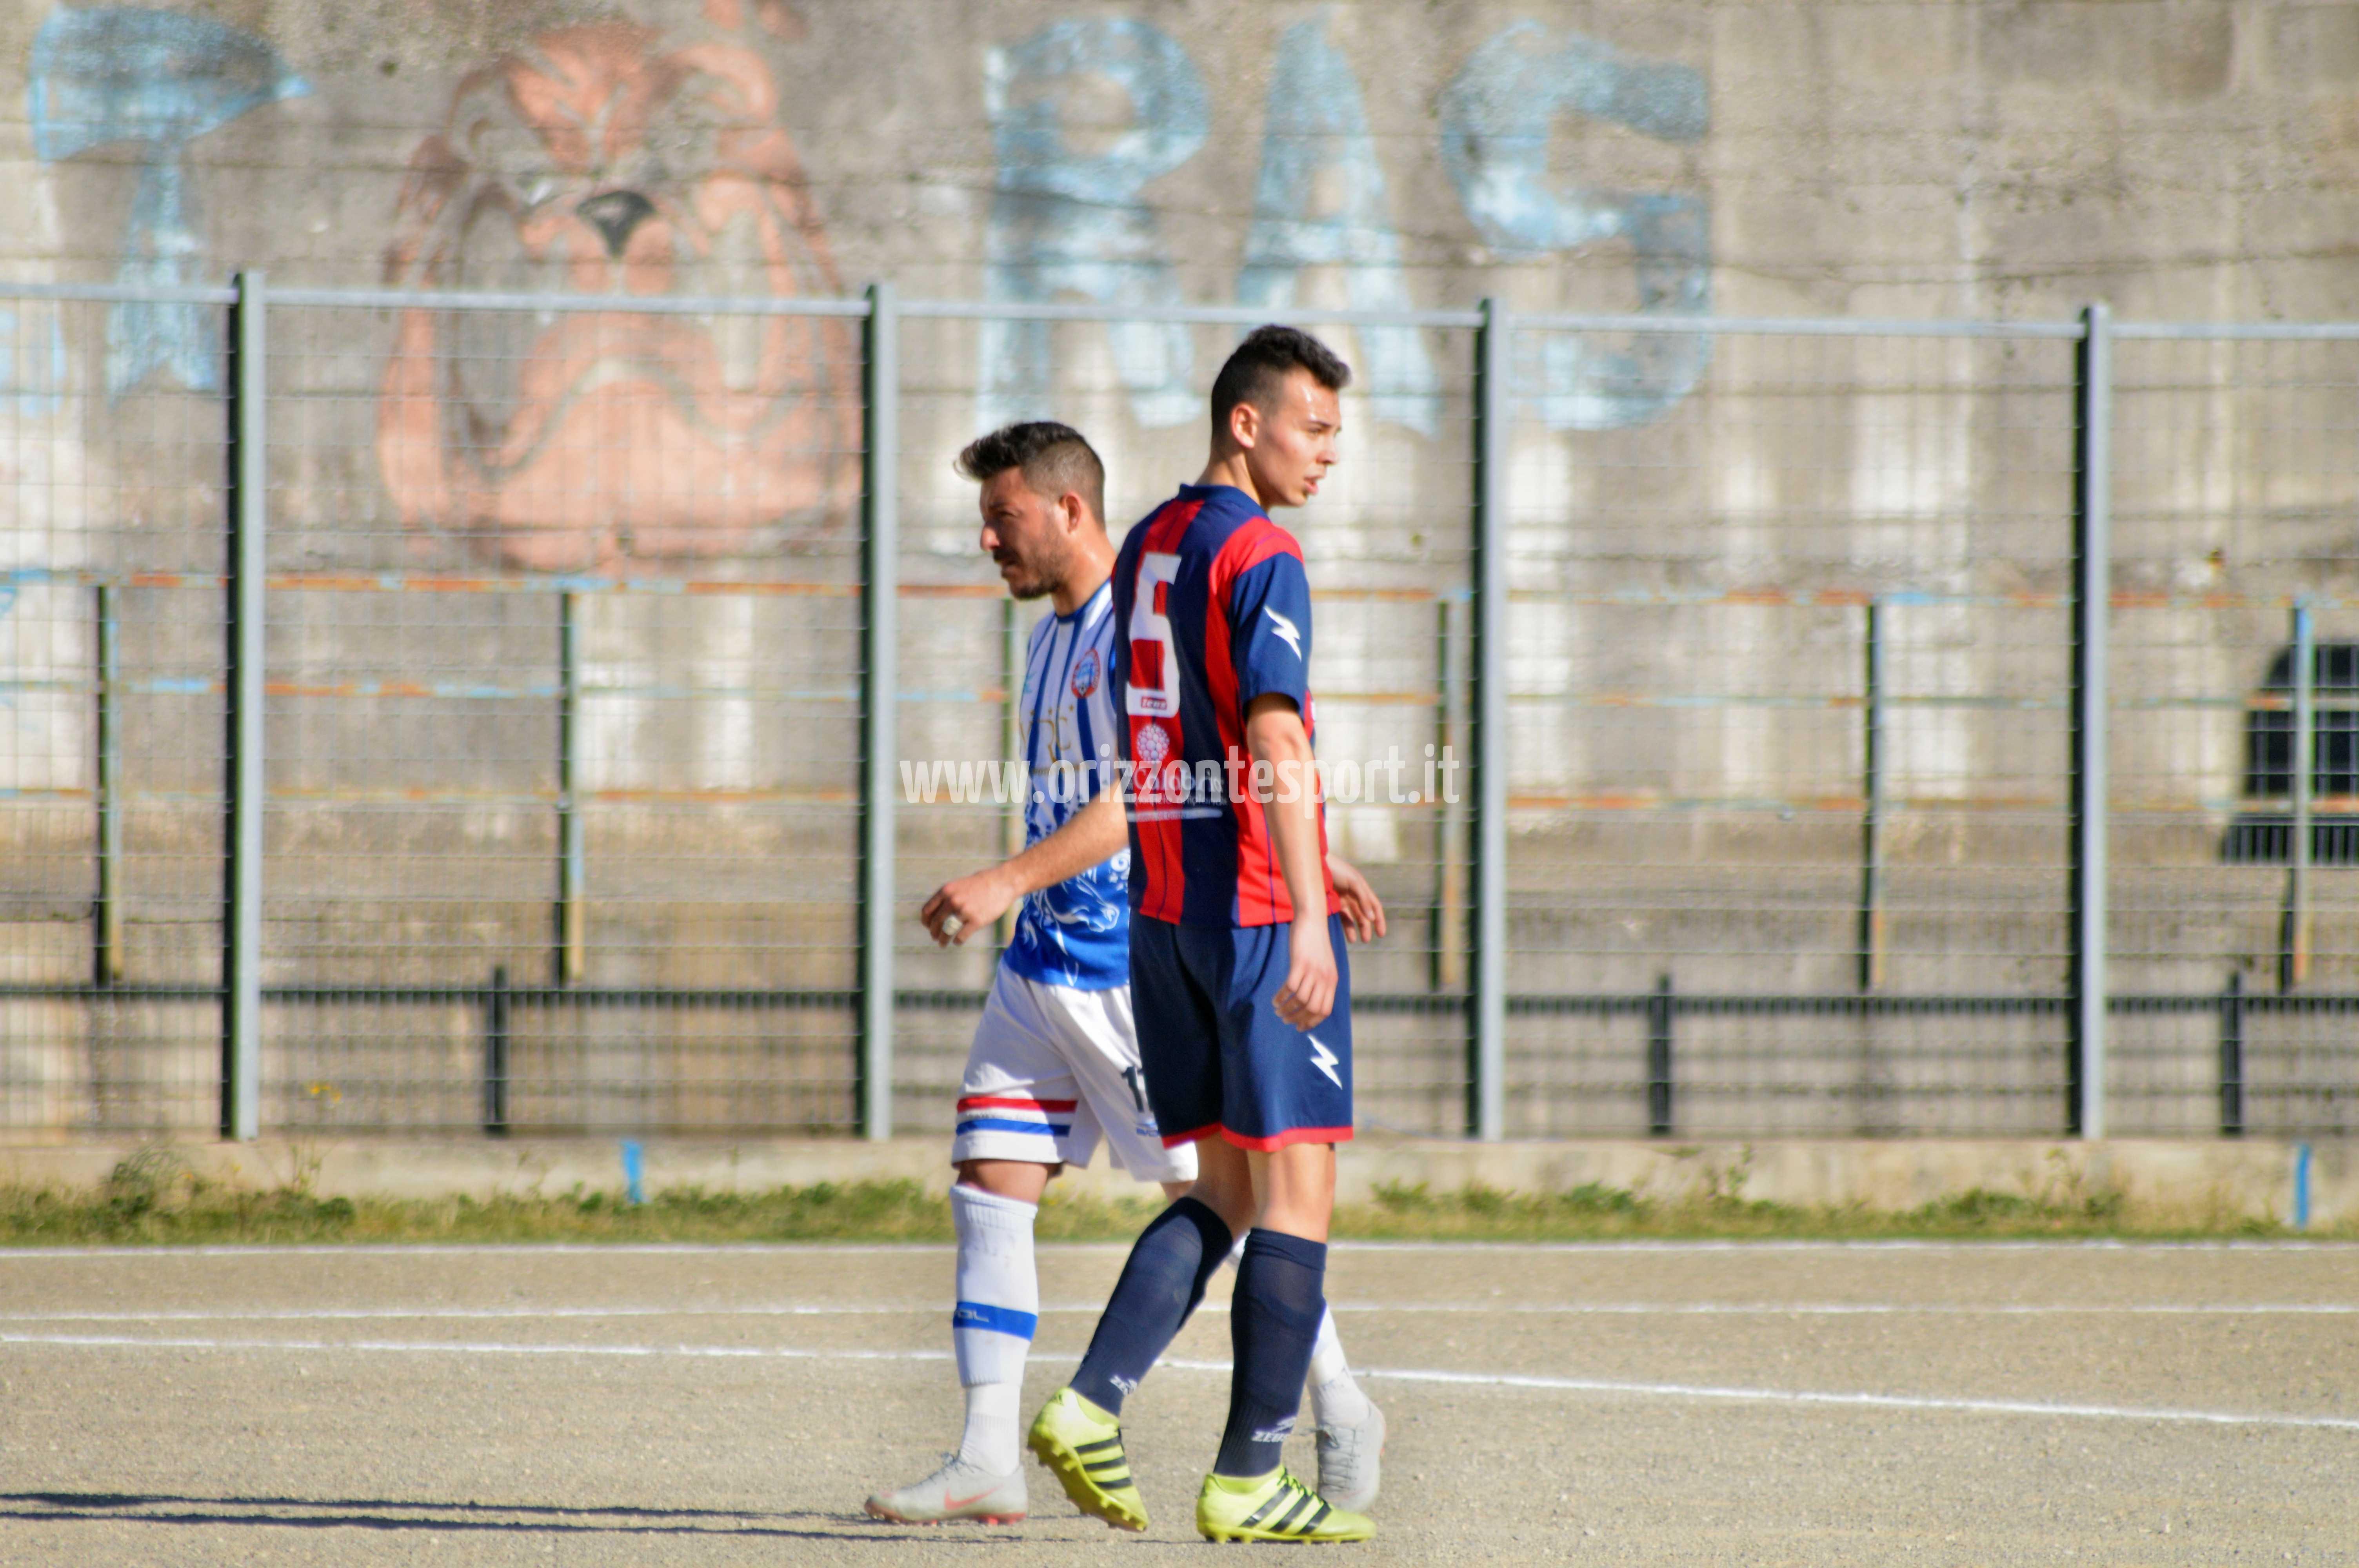 cassano_rossanese (52)